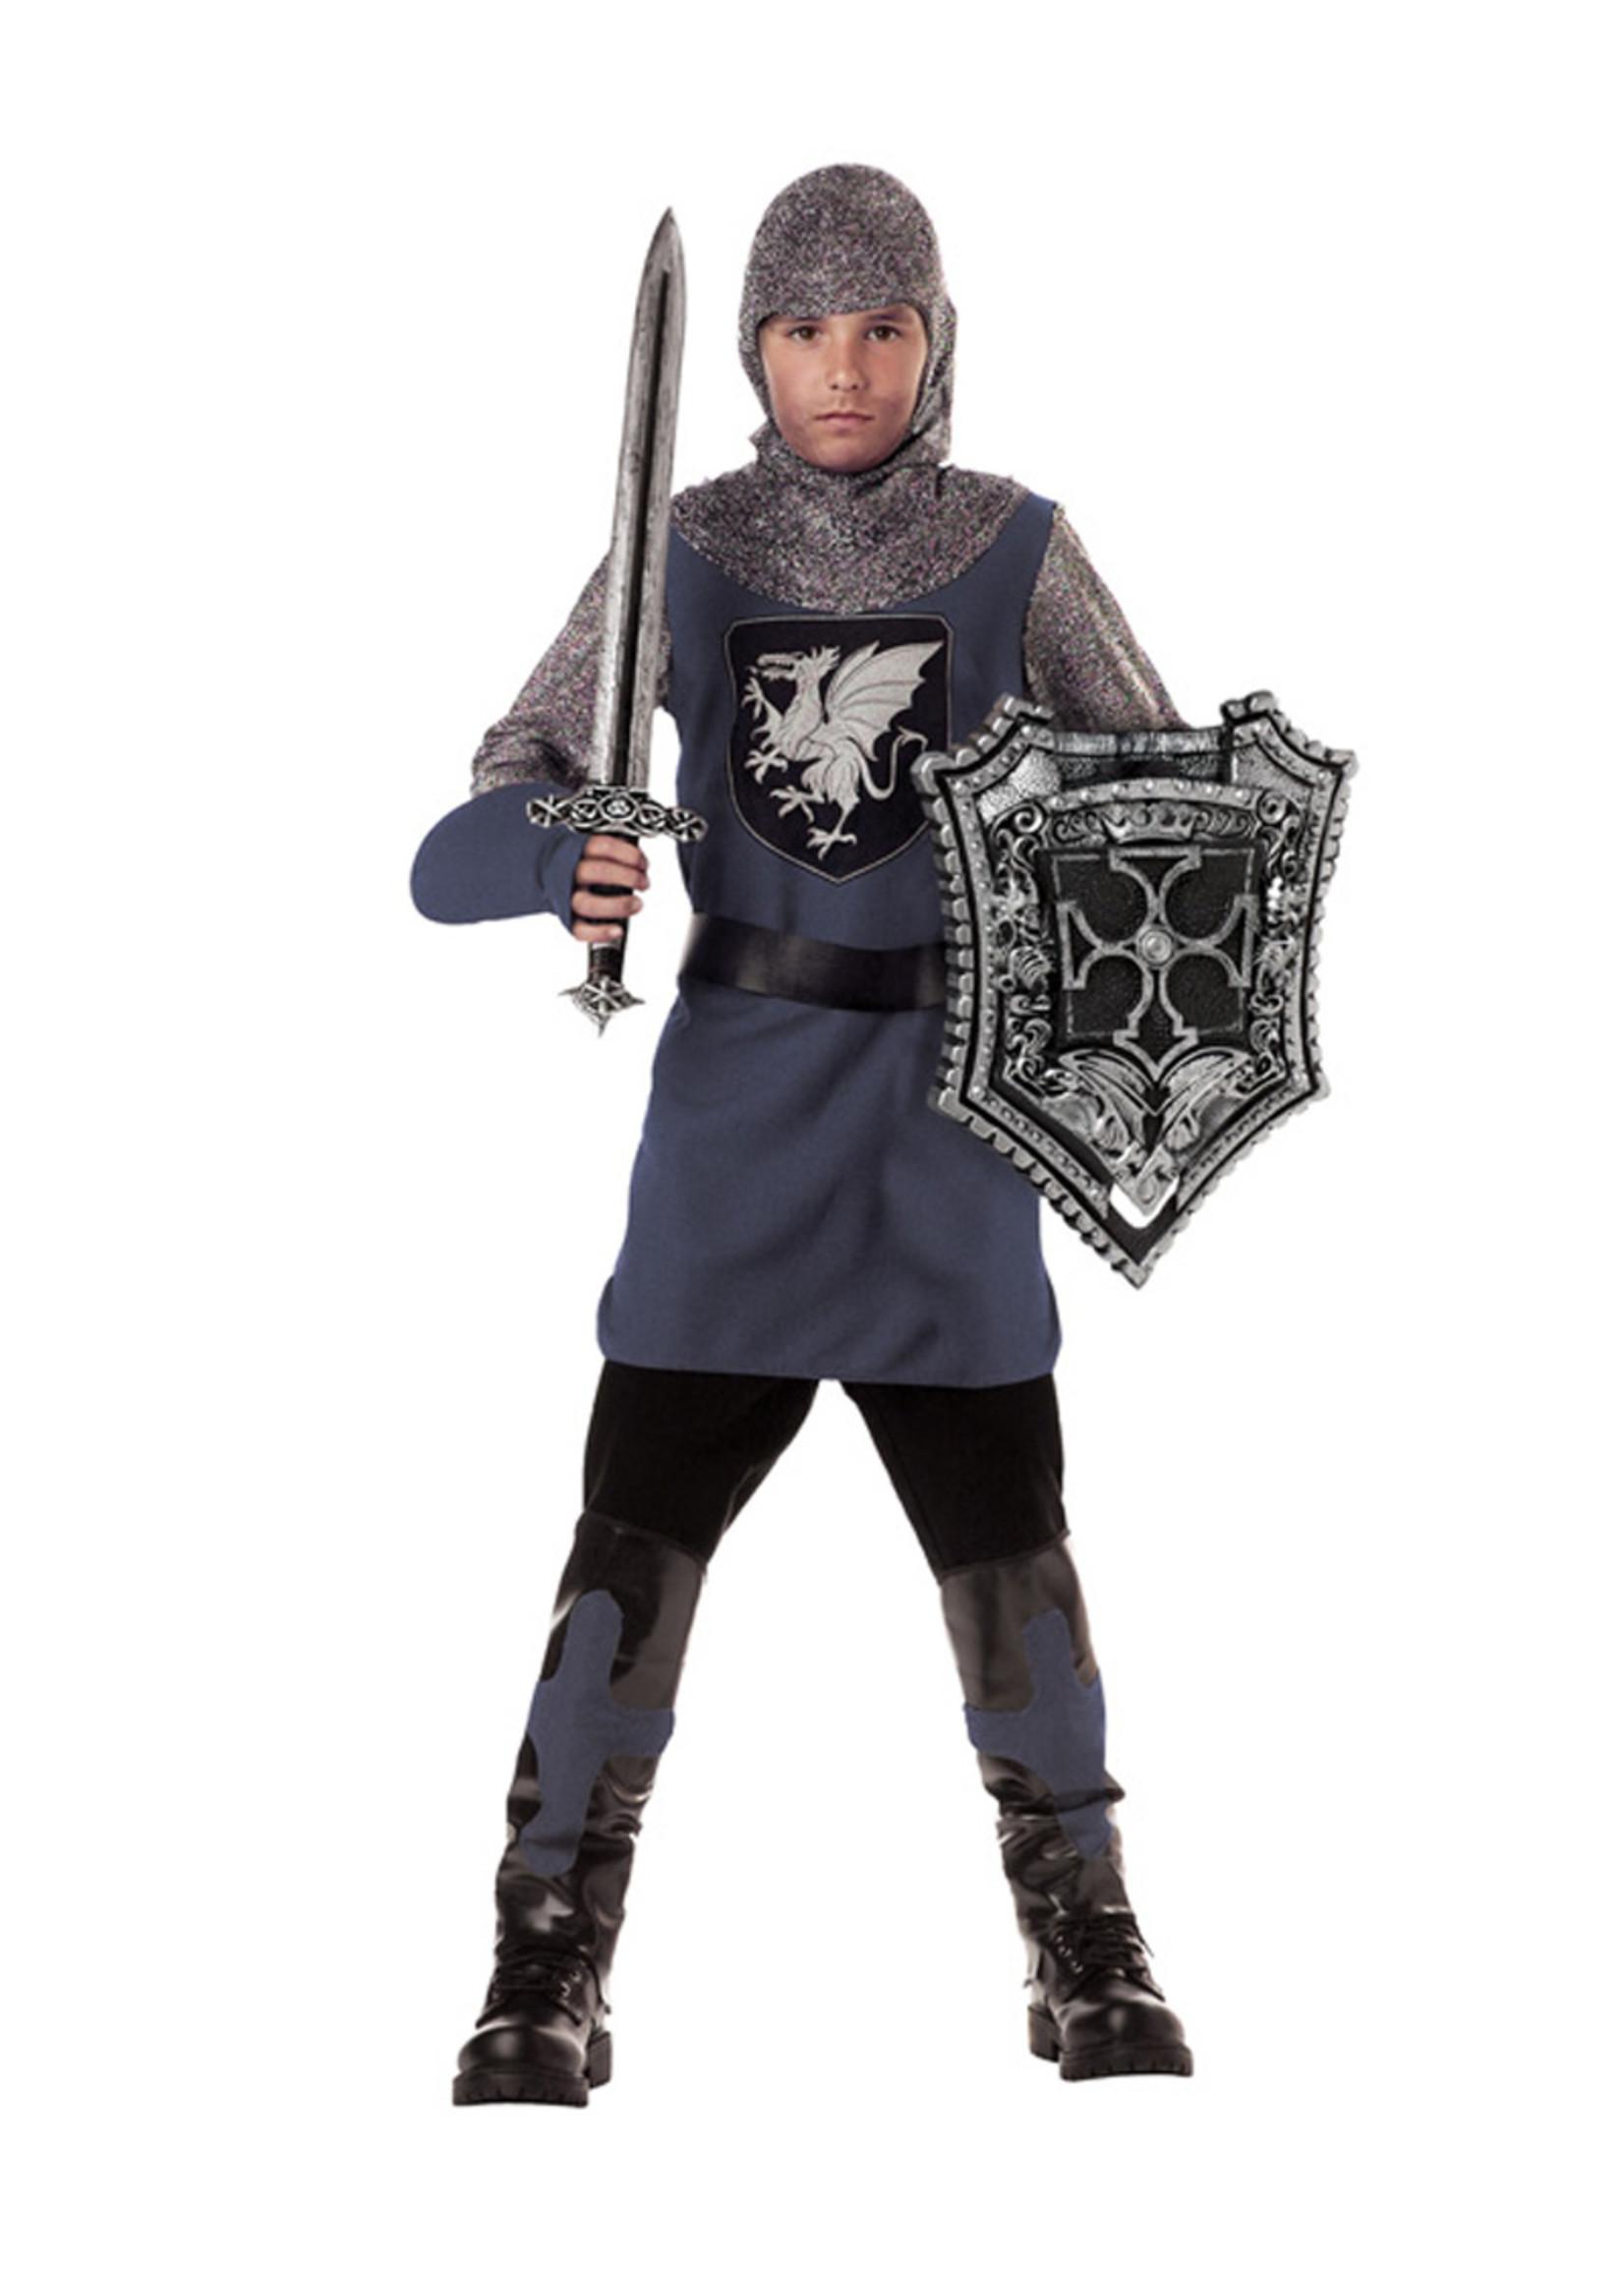 Valiant Knight Costume - Boys